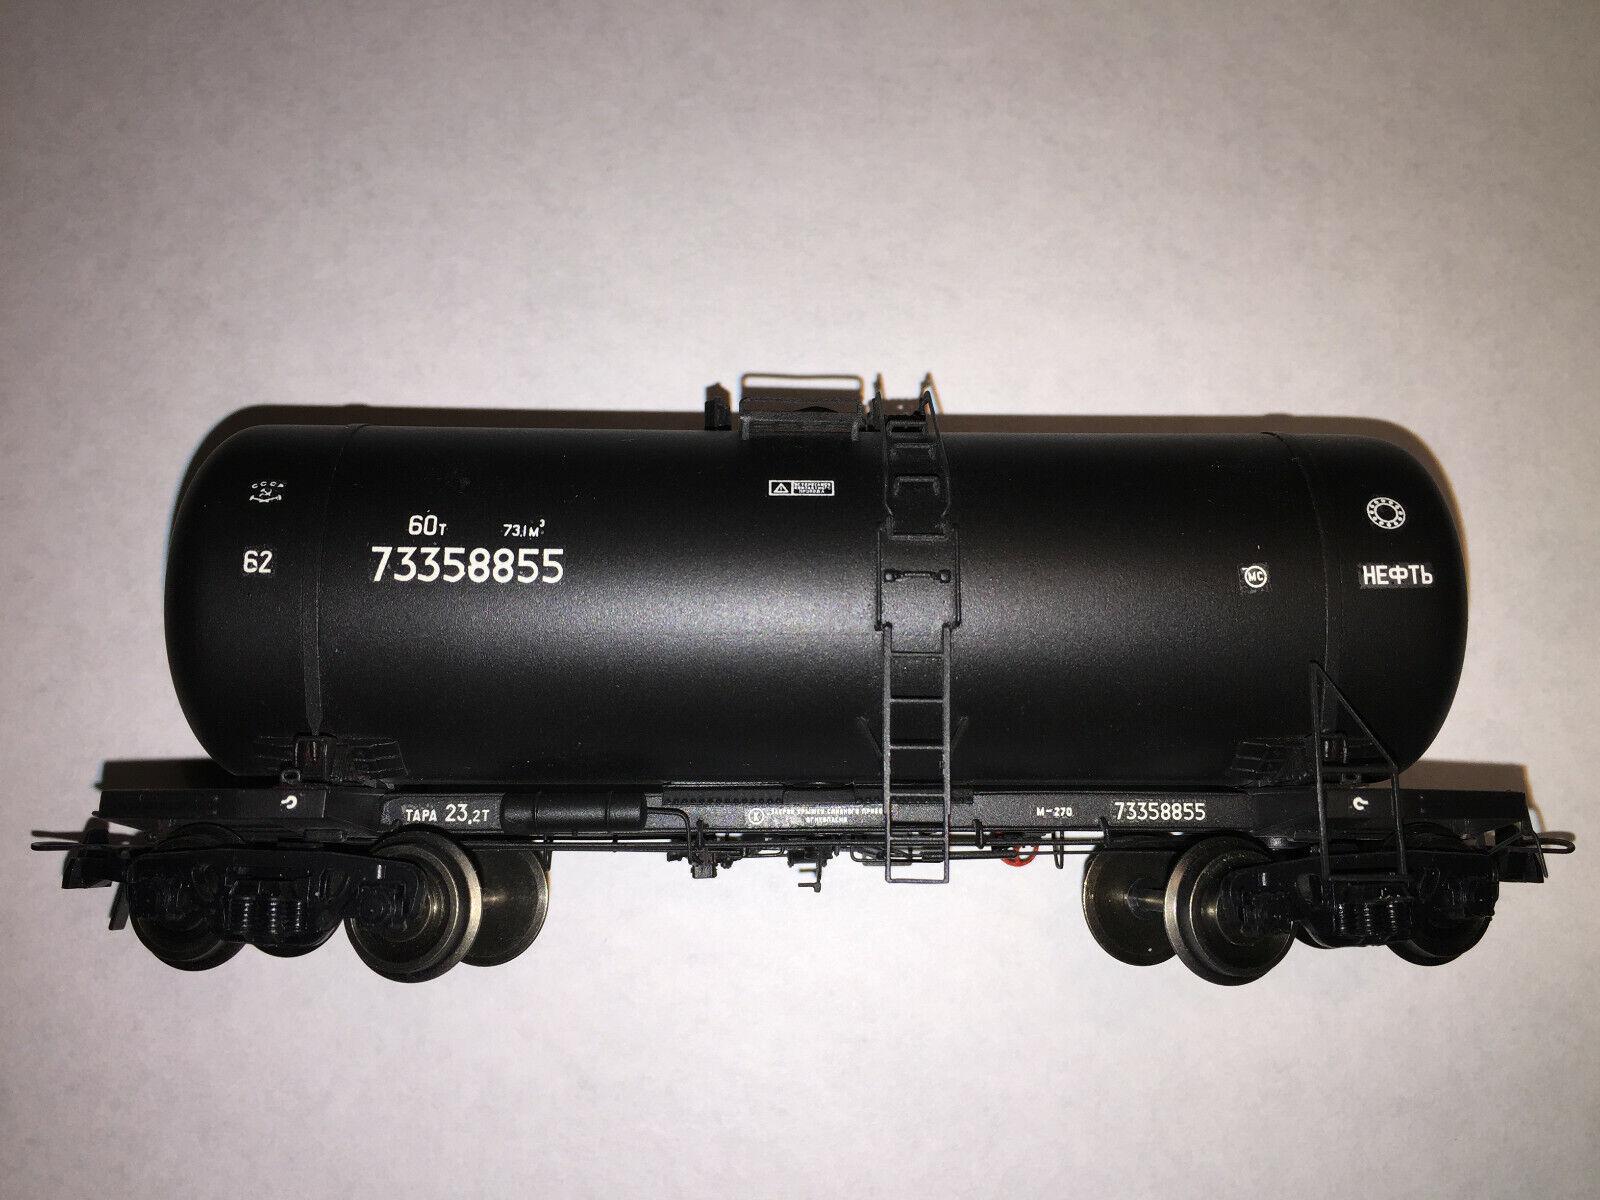 Szd RZD URSS eje de cuatro  73358855 negro coche del tanque de petróleo crudo Onega En Escala Ho